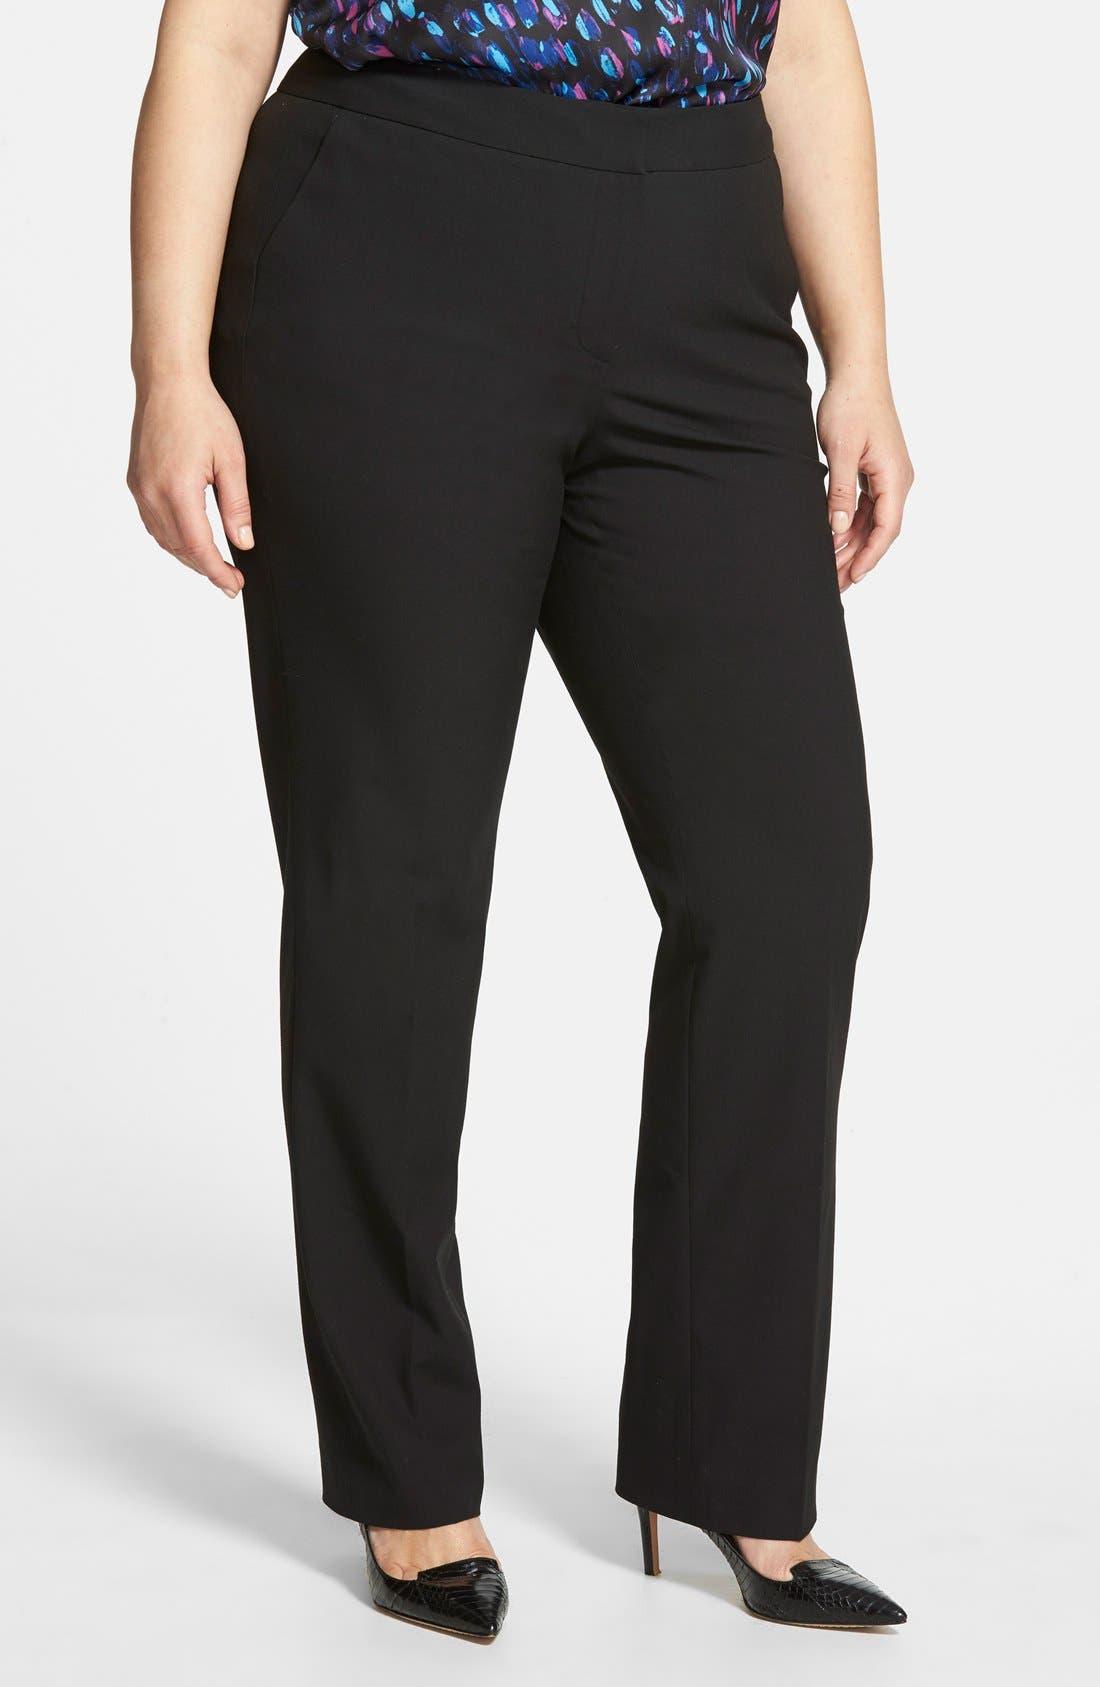 Alternate Image 1 Selected - Sejour 'Ela' Modern Fit Pants (Plus Size & Petite Plus)